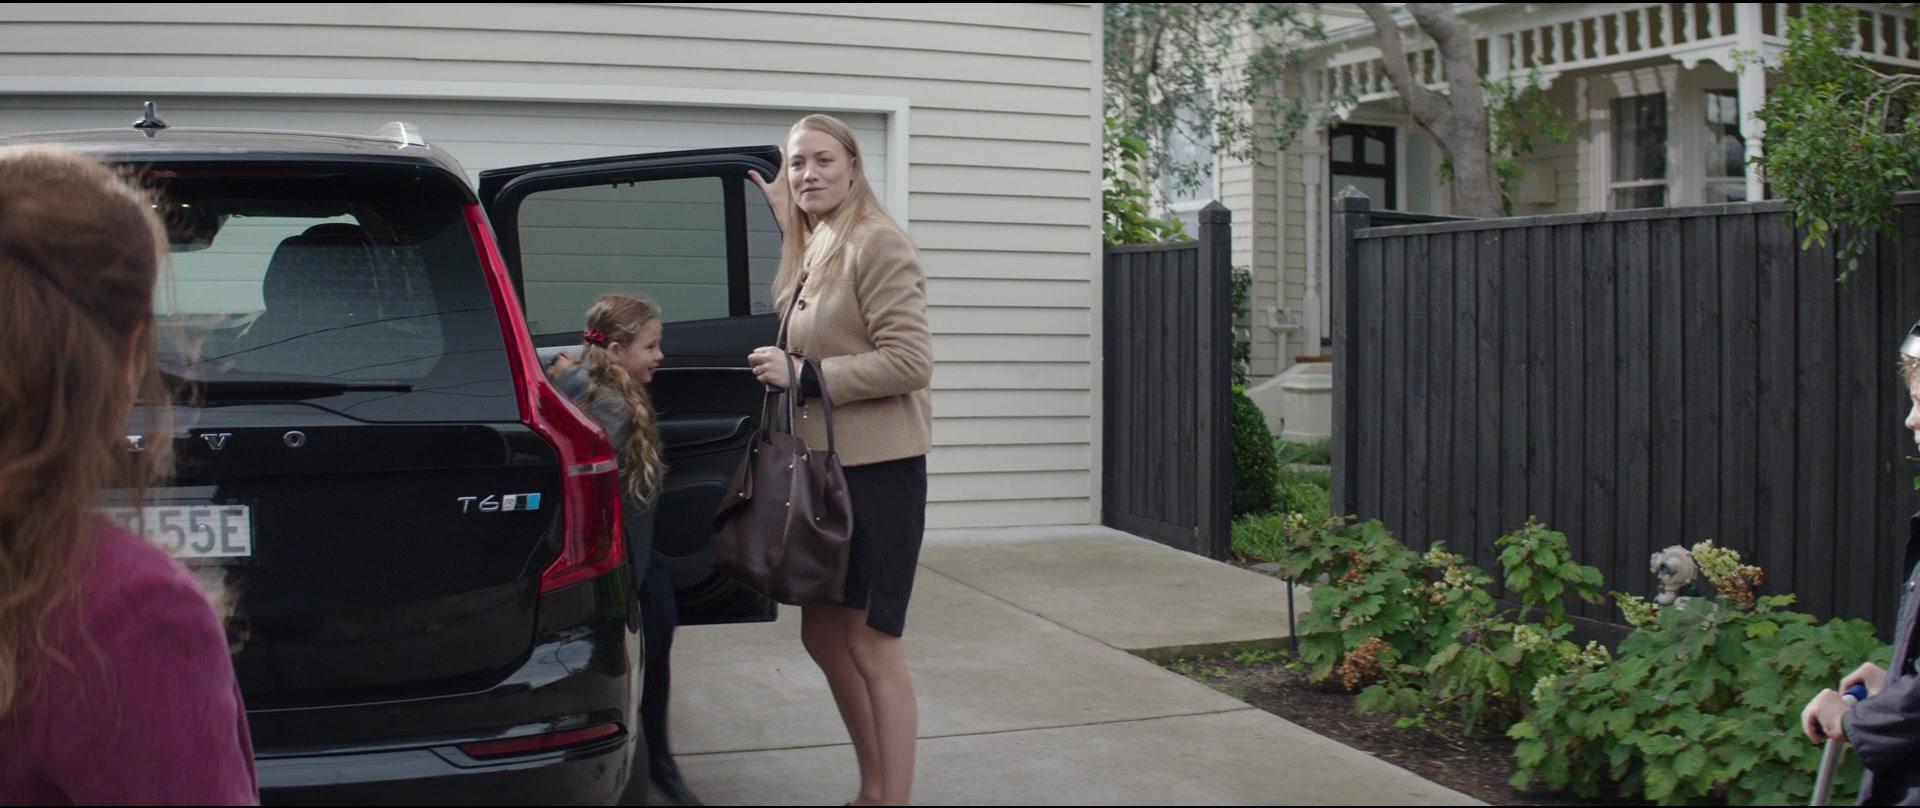 Volvo XC90 Black Car Used by Yvonne Strahovski in Angel of Mine (2019)